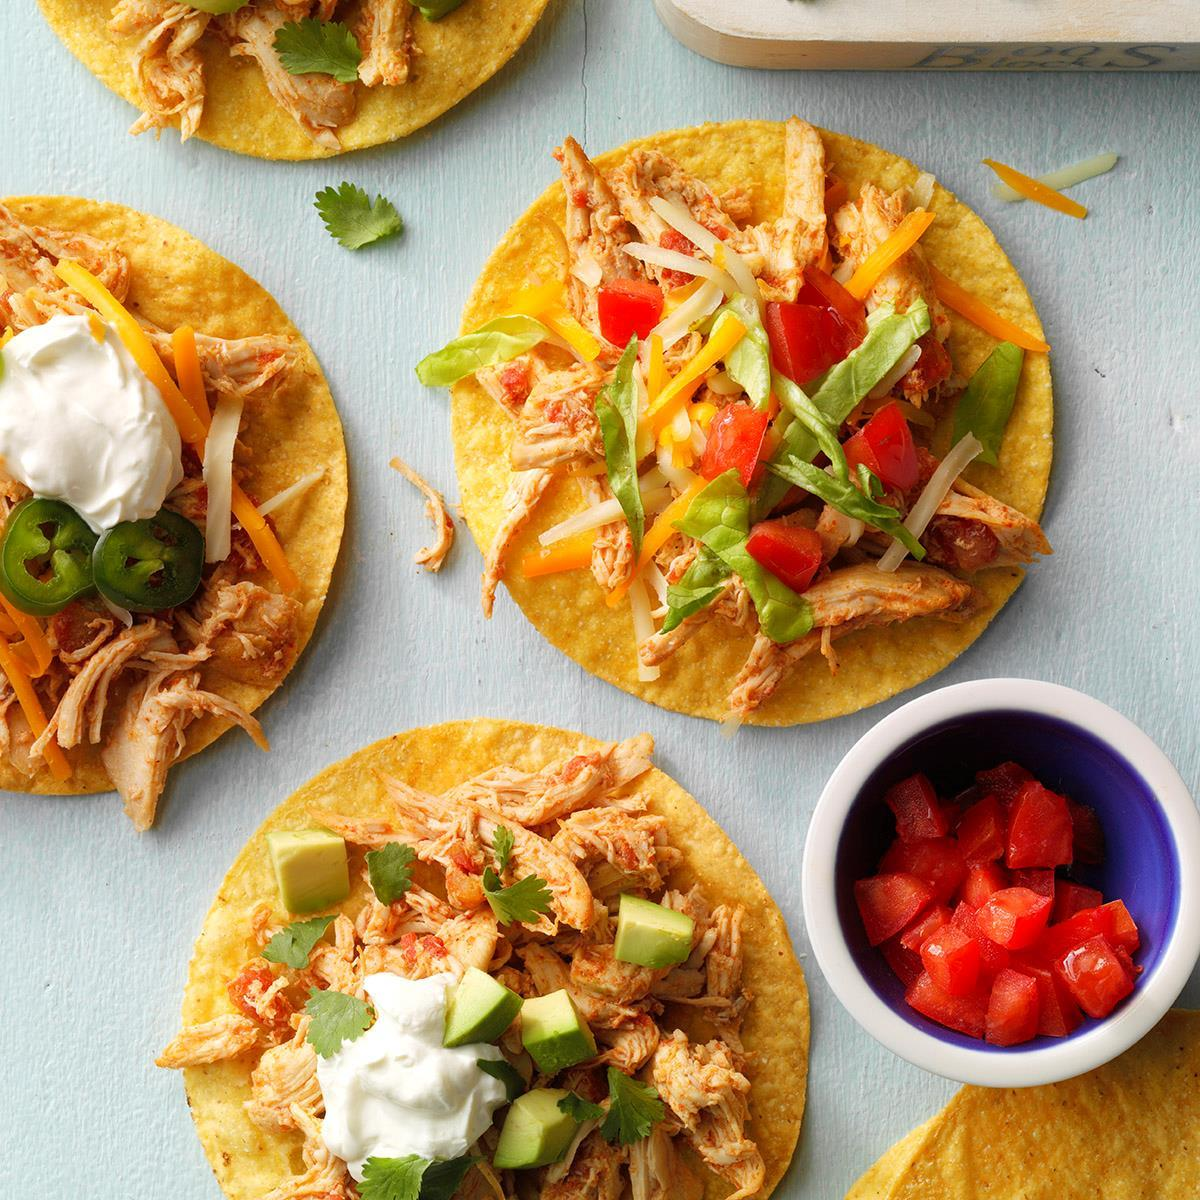 Shredded Chicken Tostadas Recipe How To Make It Taste Of Home